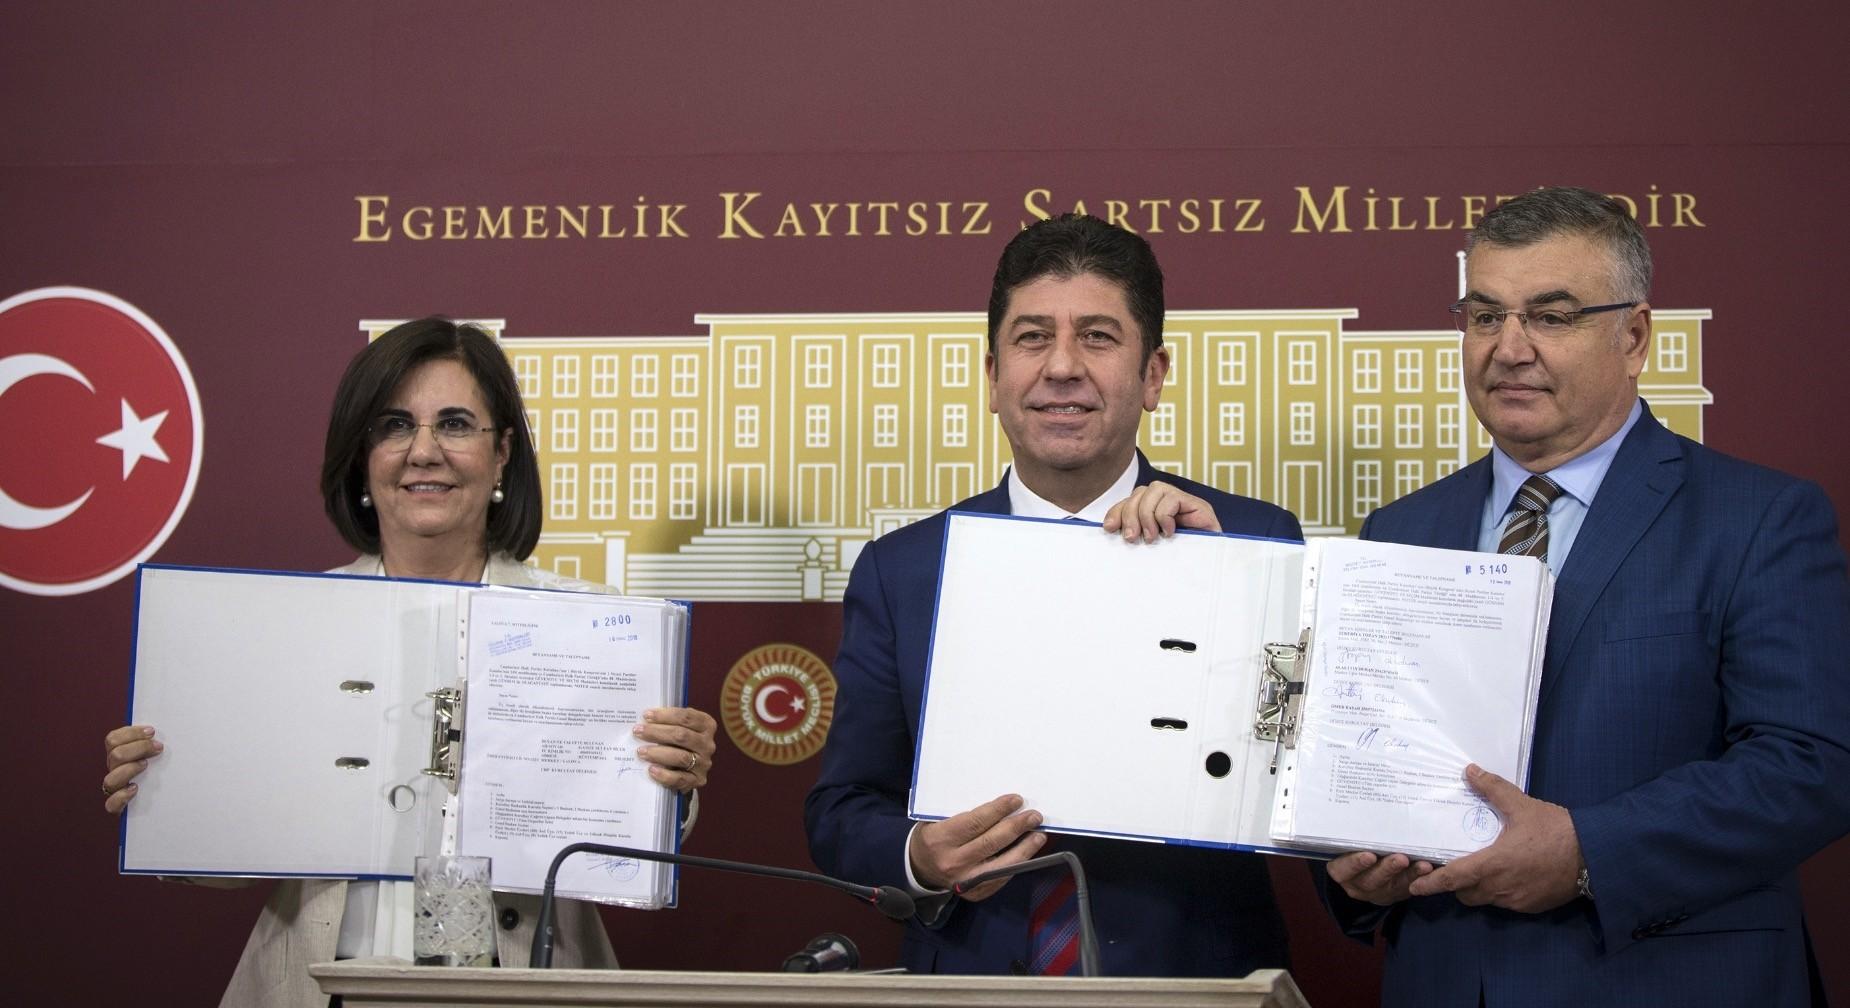 CHP Party Assembly member Gaye Usluer (L) with CHP Bilecik province deputy, Yau015far Tu00fczu00fcn (C) and Ku0131rklarelu0131 Mayor Mehmet Kesimou011flu showing signatures collected for convention.